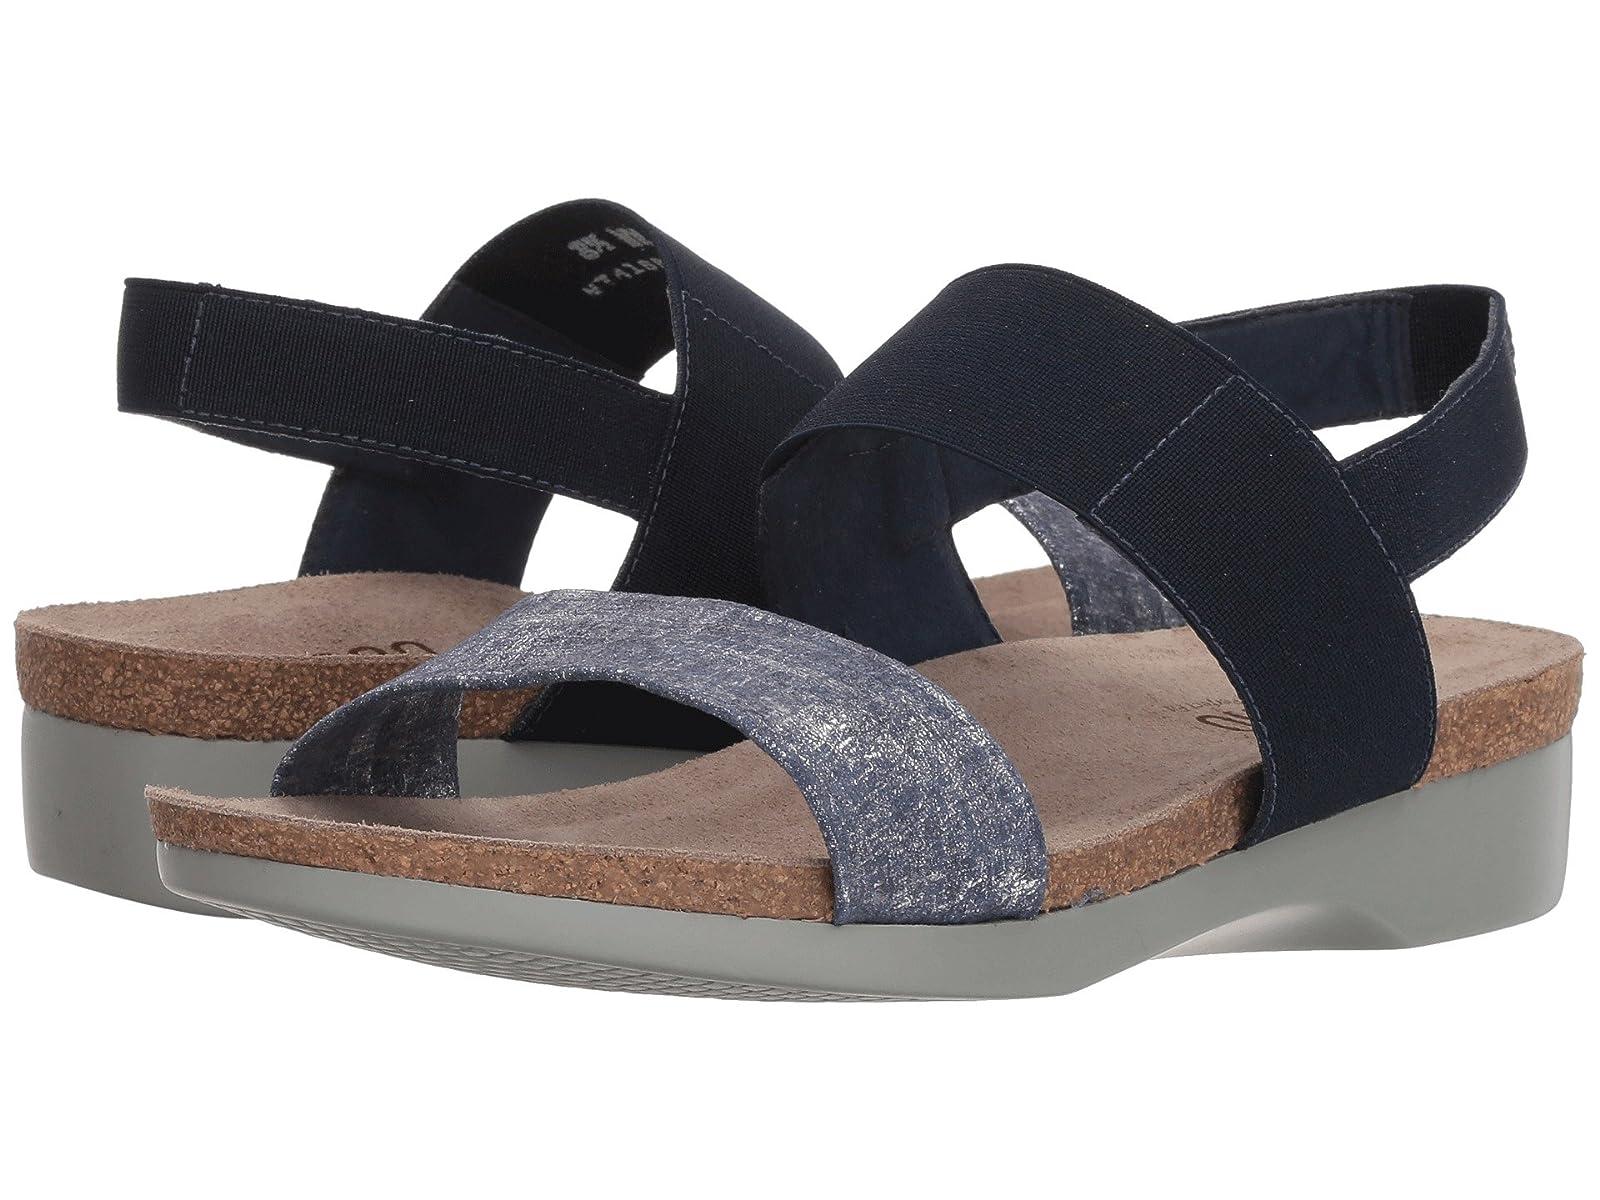 Munro PiscesAtmospheric grades have affordable shoes